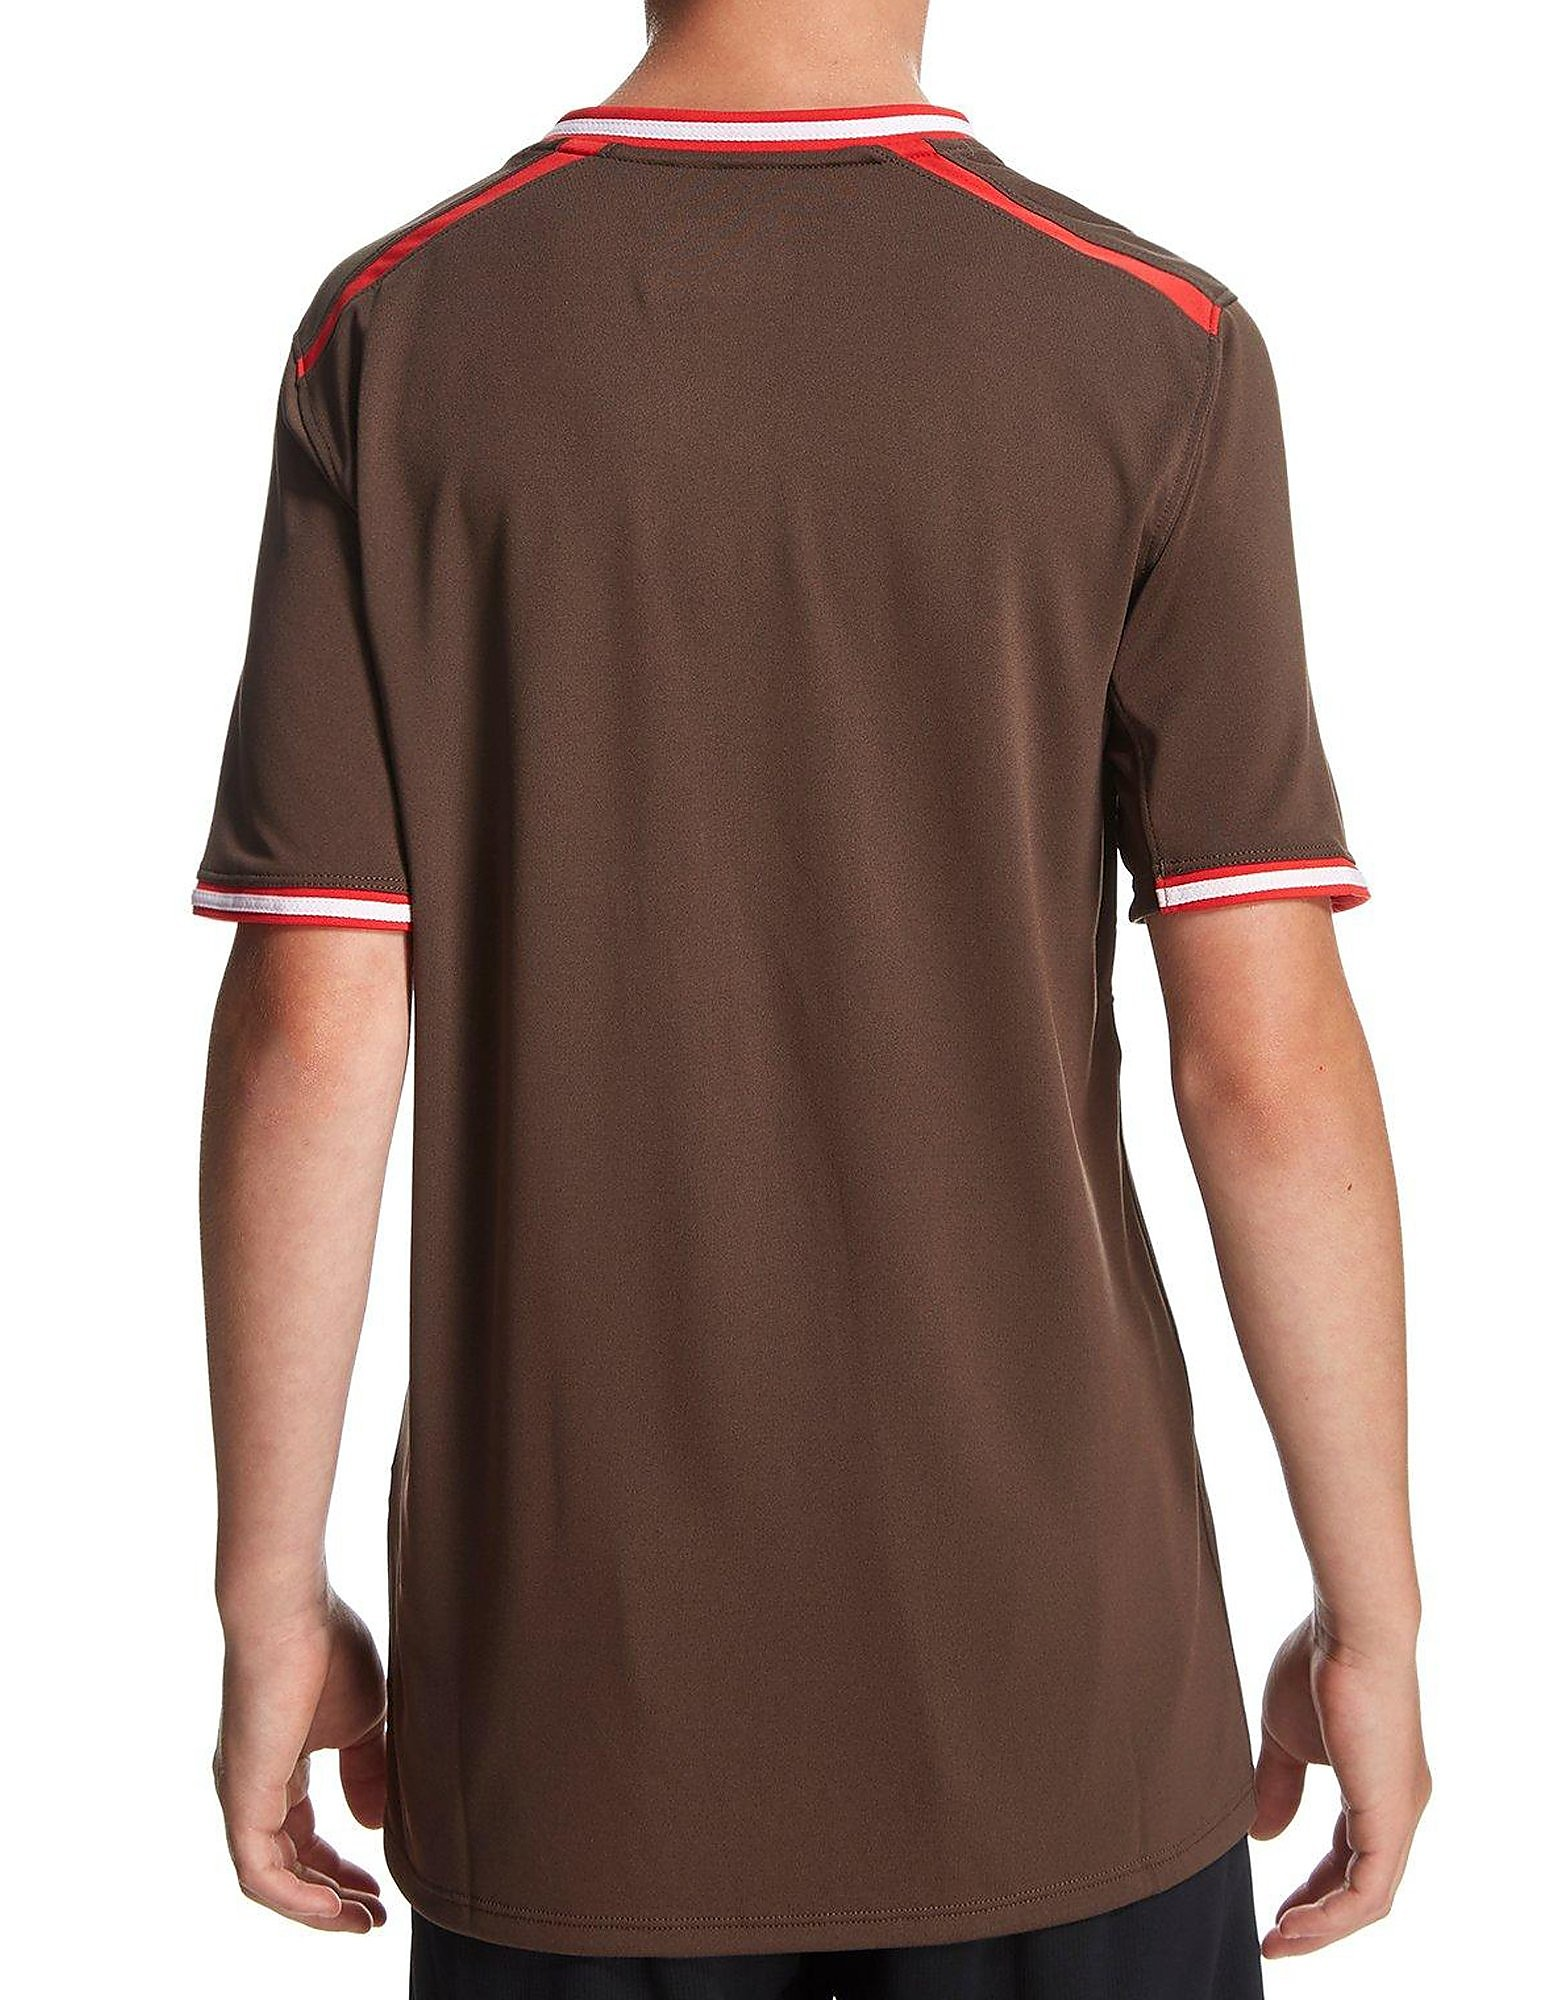 Under Armour FC St Pauli 2016/17 Home Shirt Junior